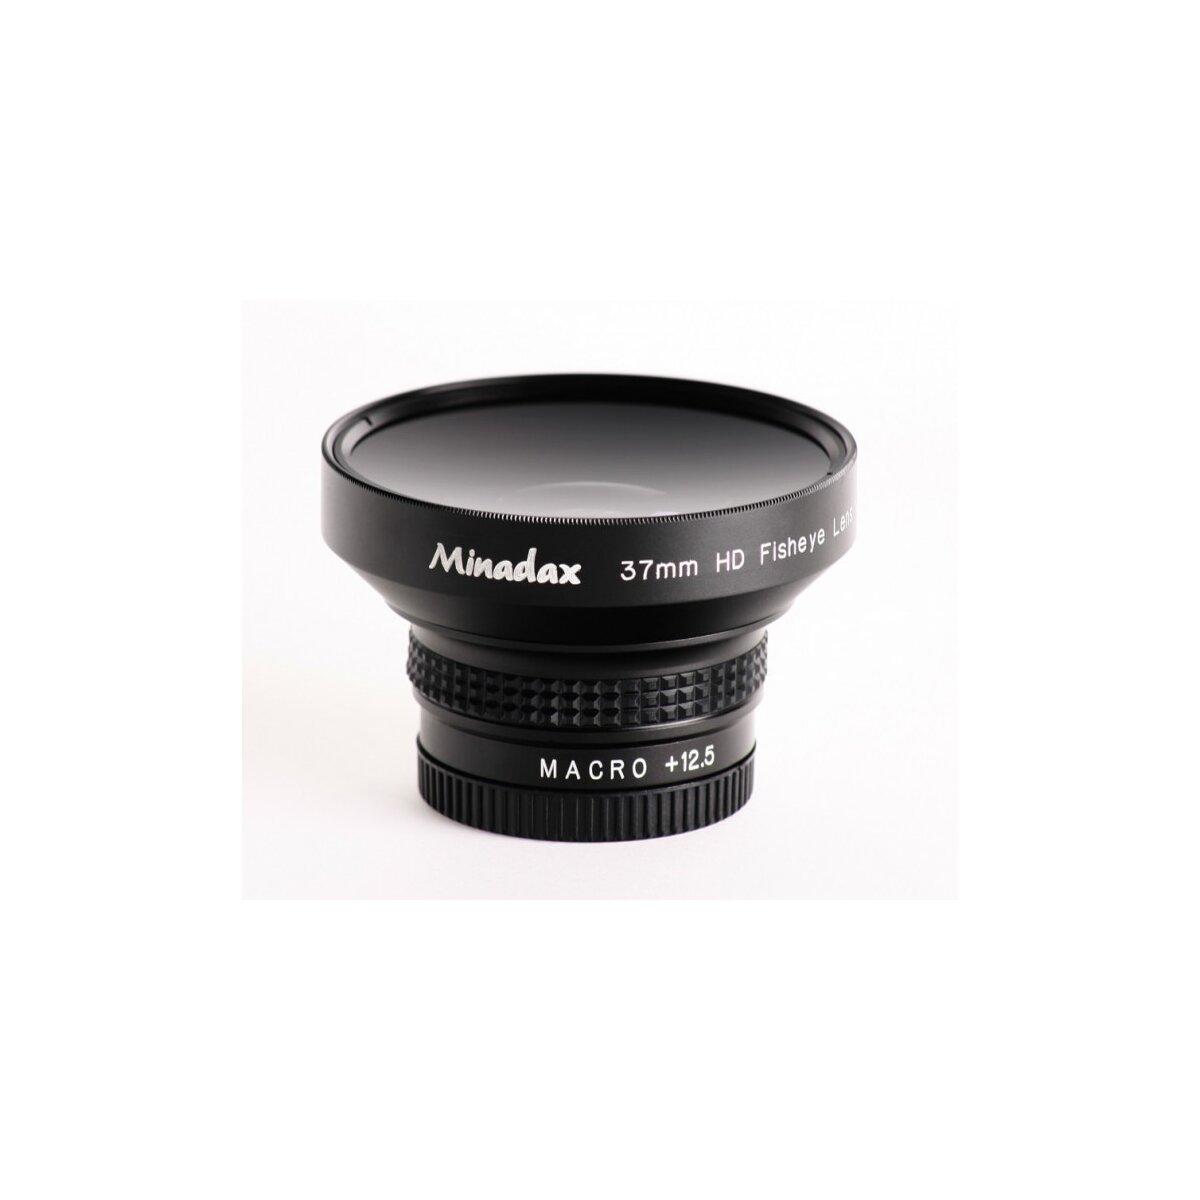 Minadax Fisheye 0.25x kompatibel mit Canon HV10, DC40, DC50, HR10, HF10, HF100